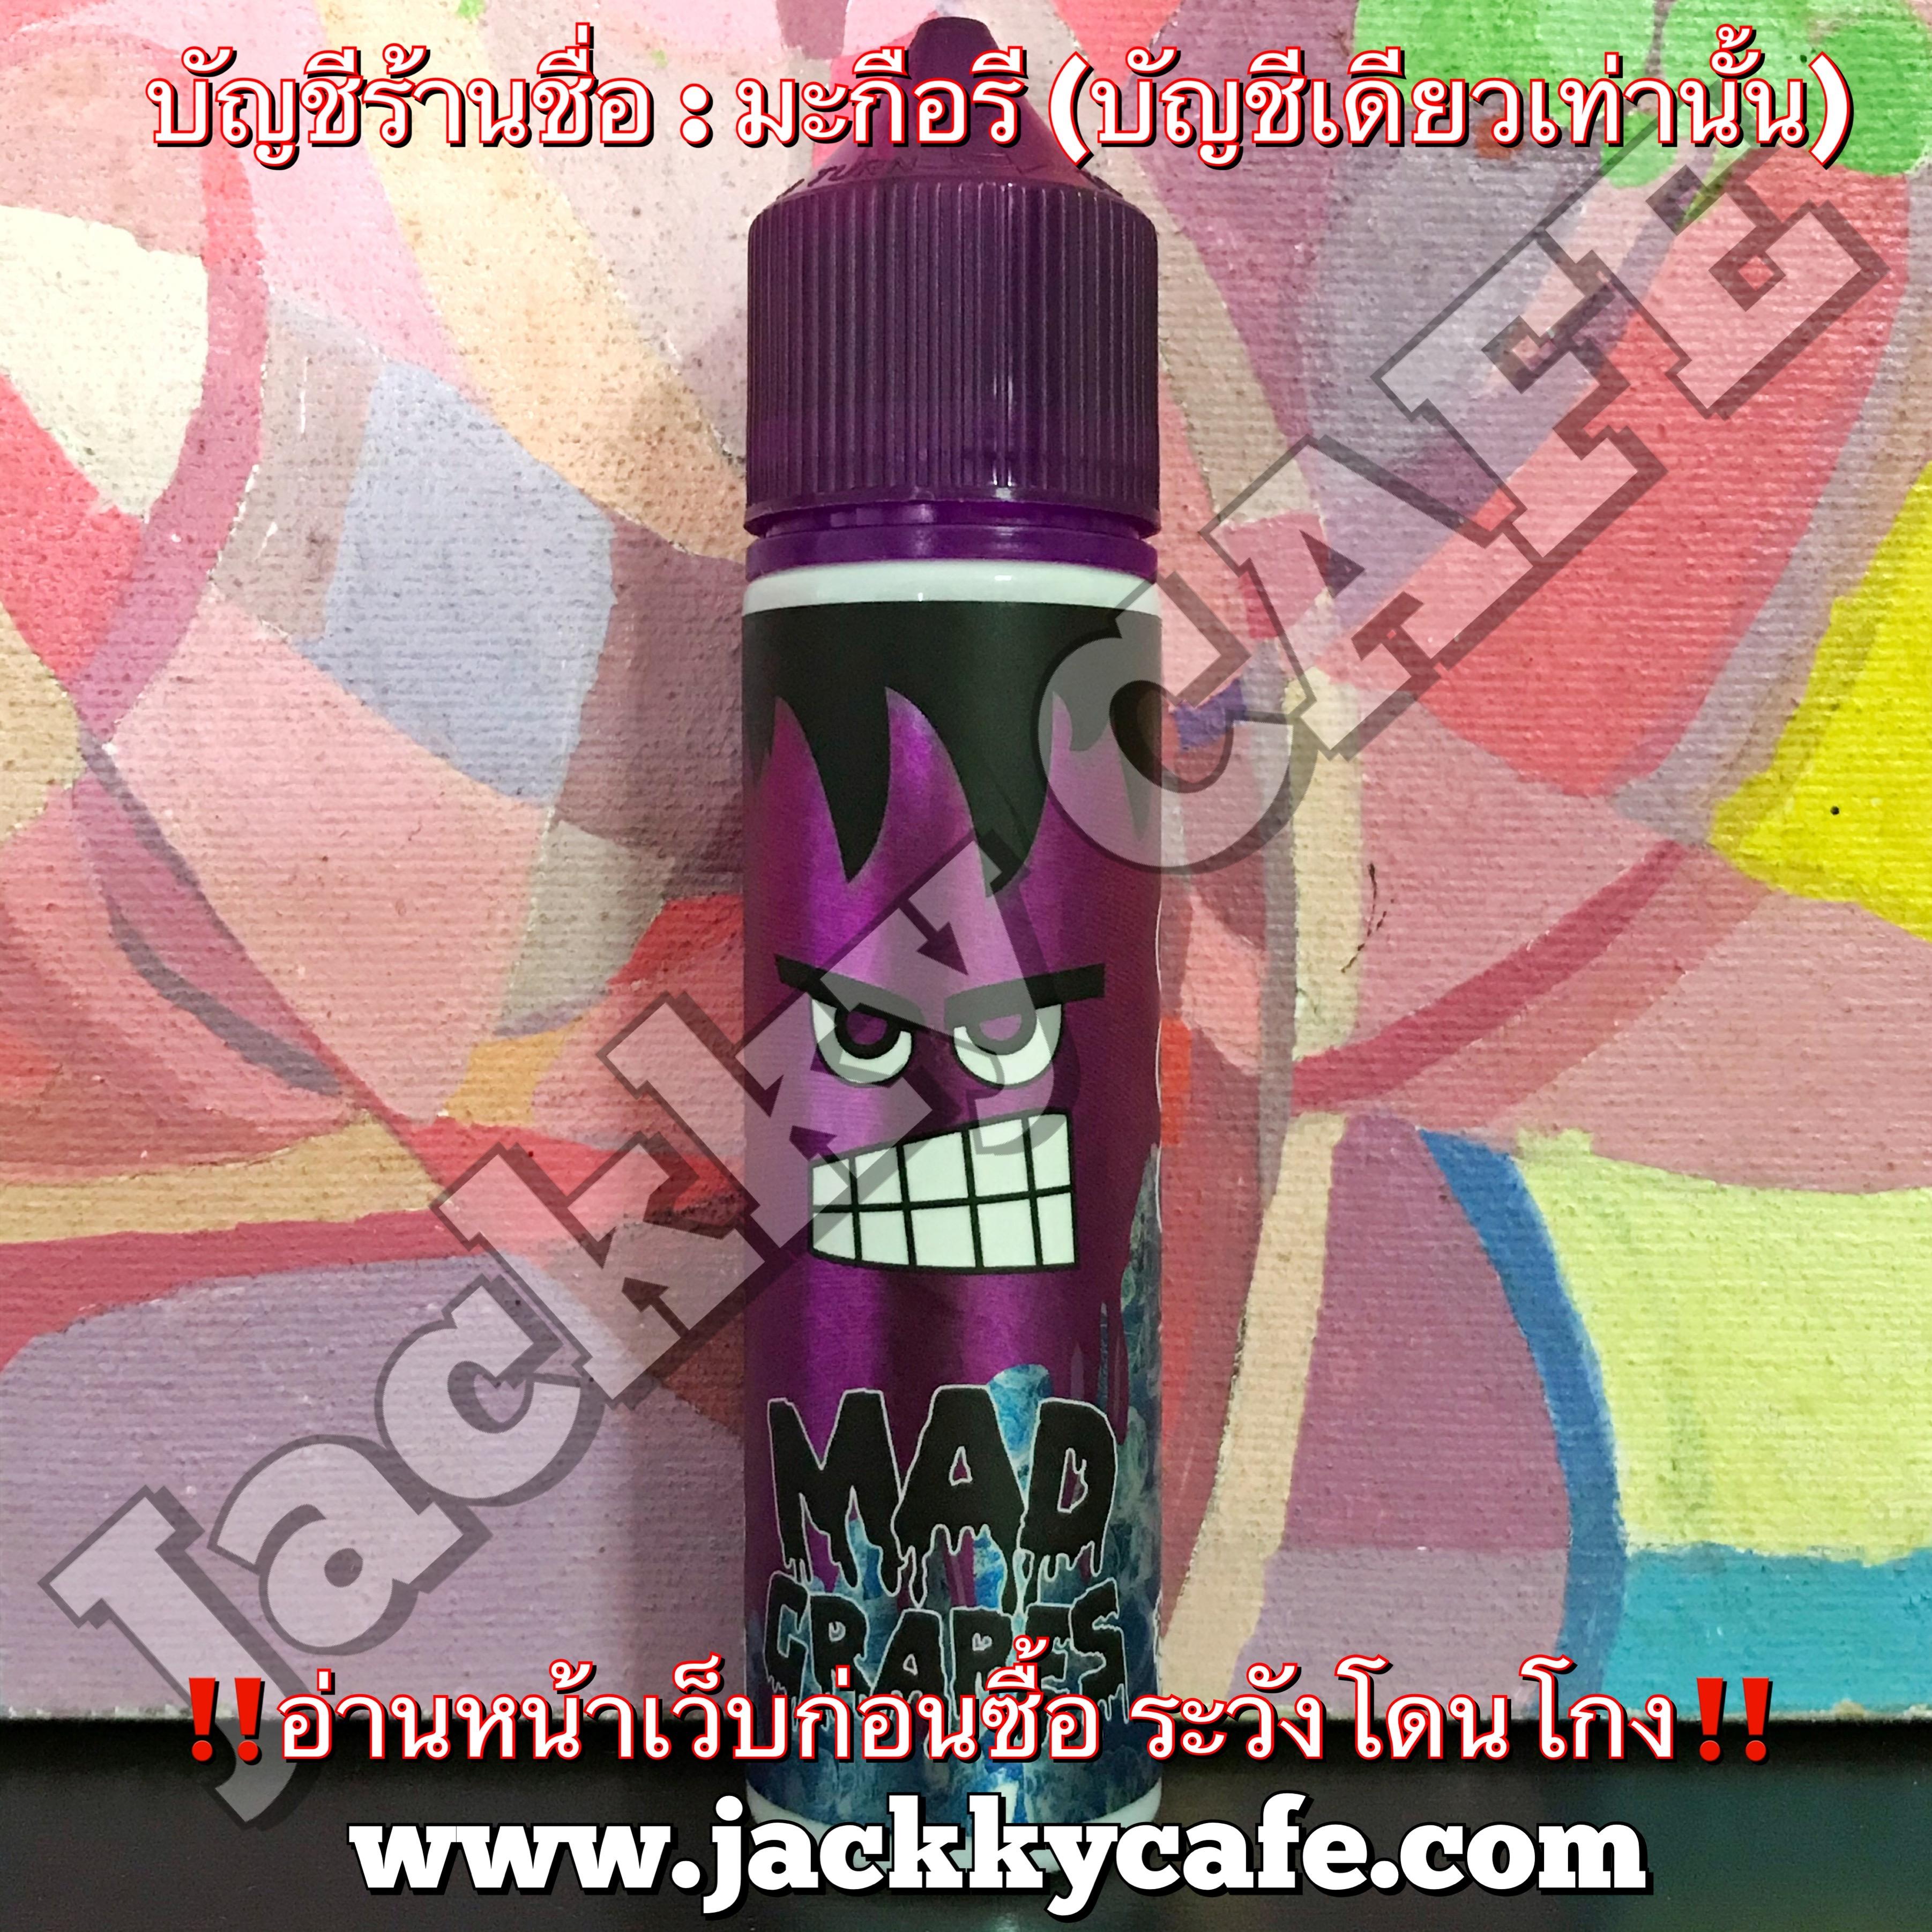 Mad Grape Ice Freebase (องุ่นบ้าไอซ์)